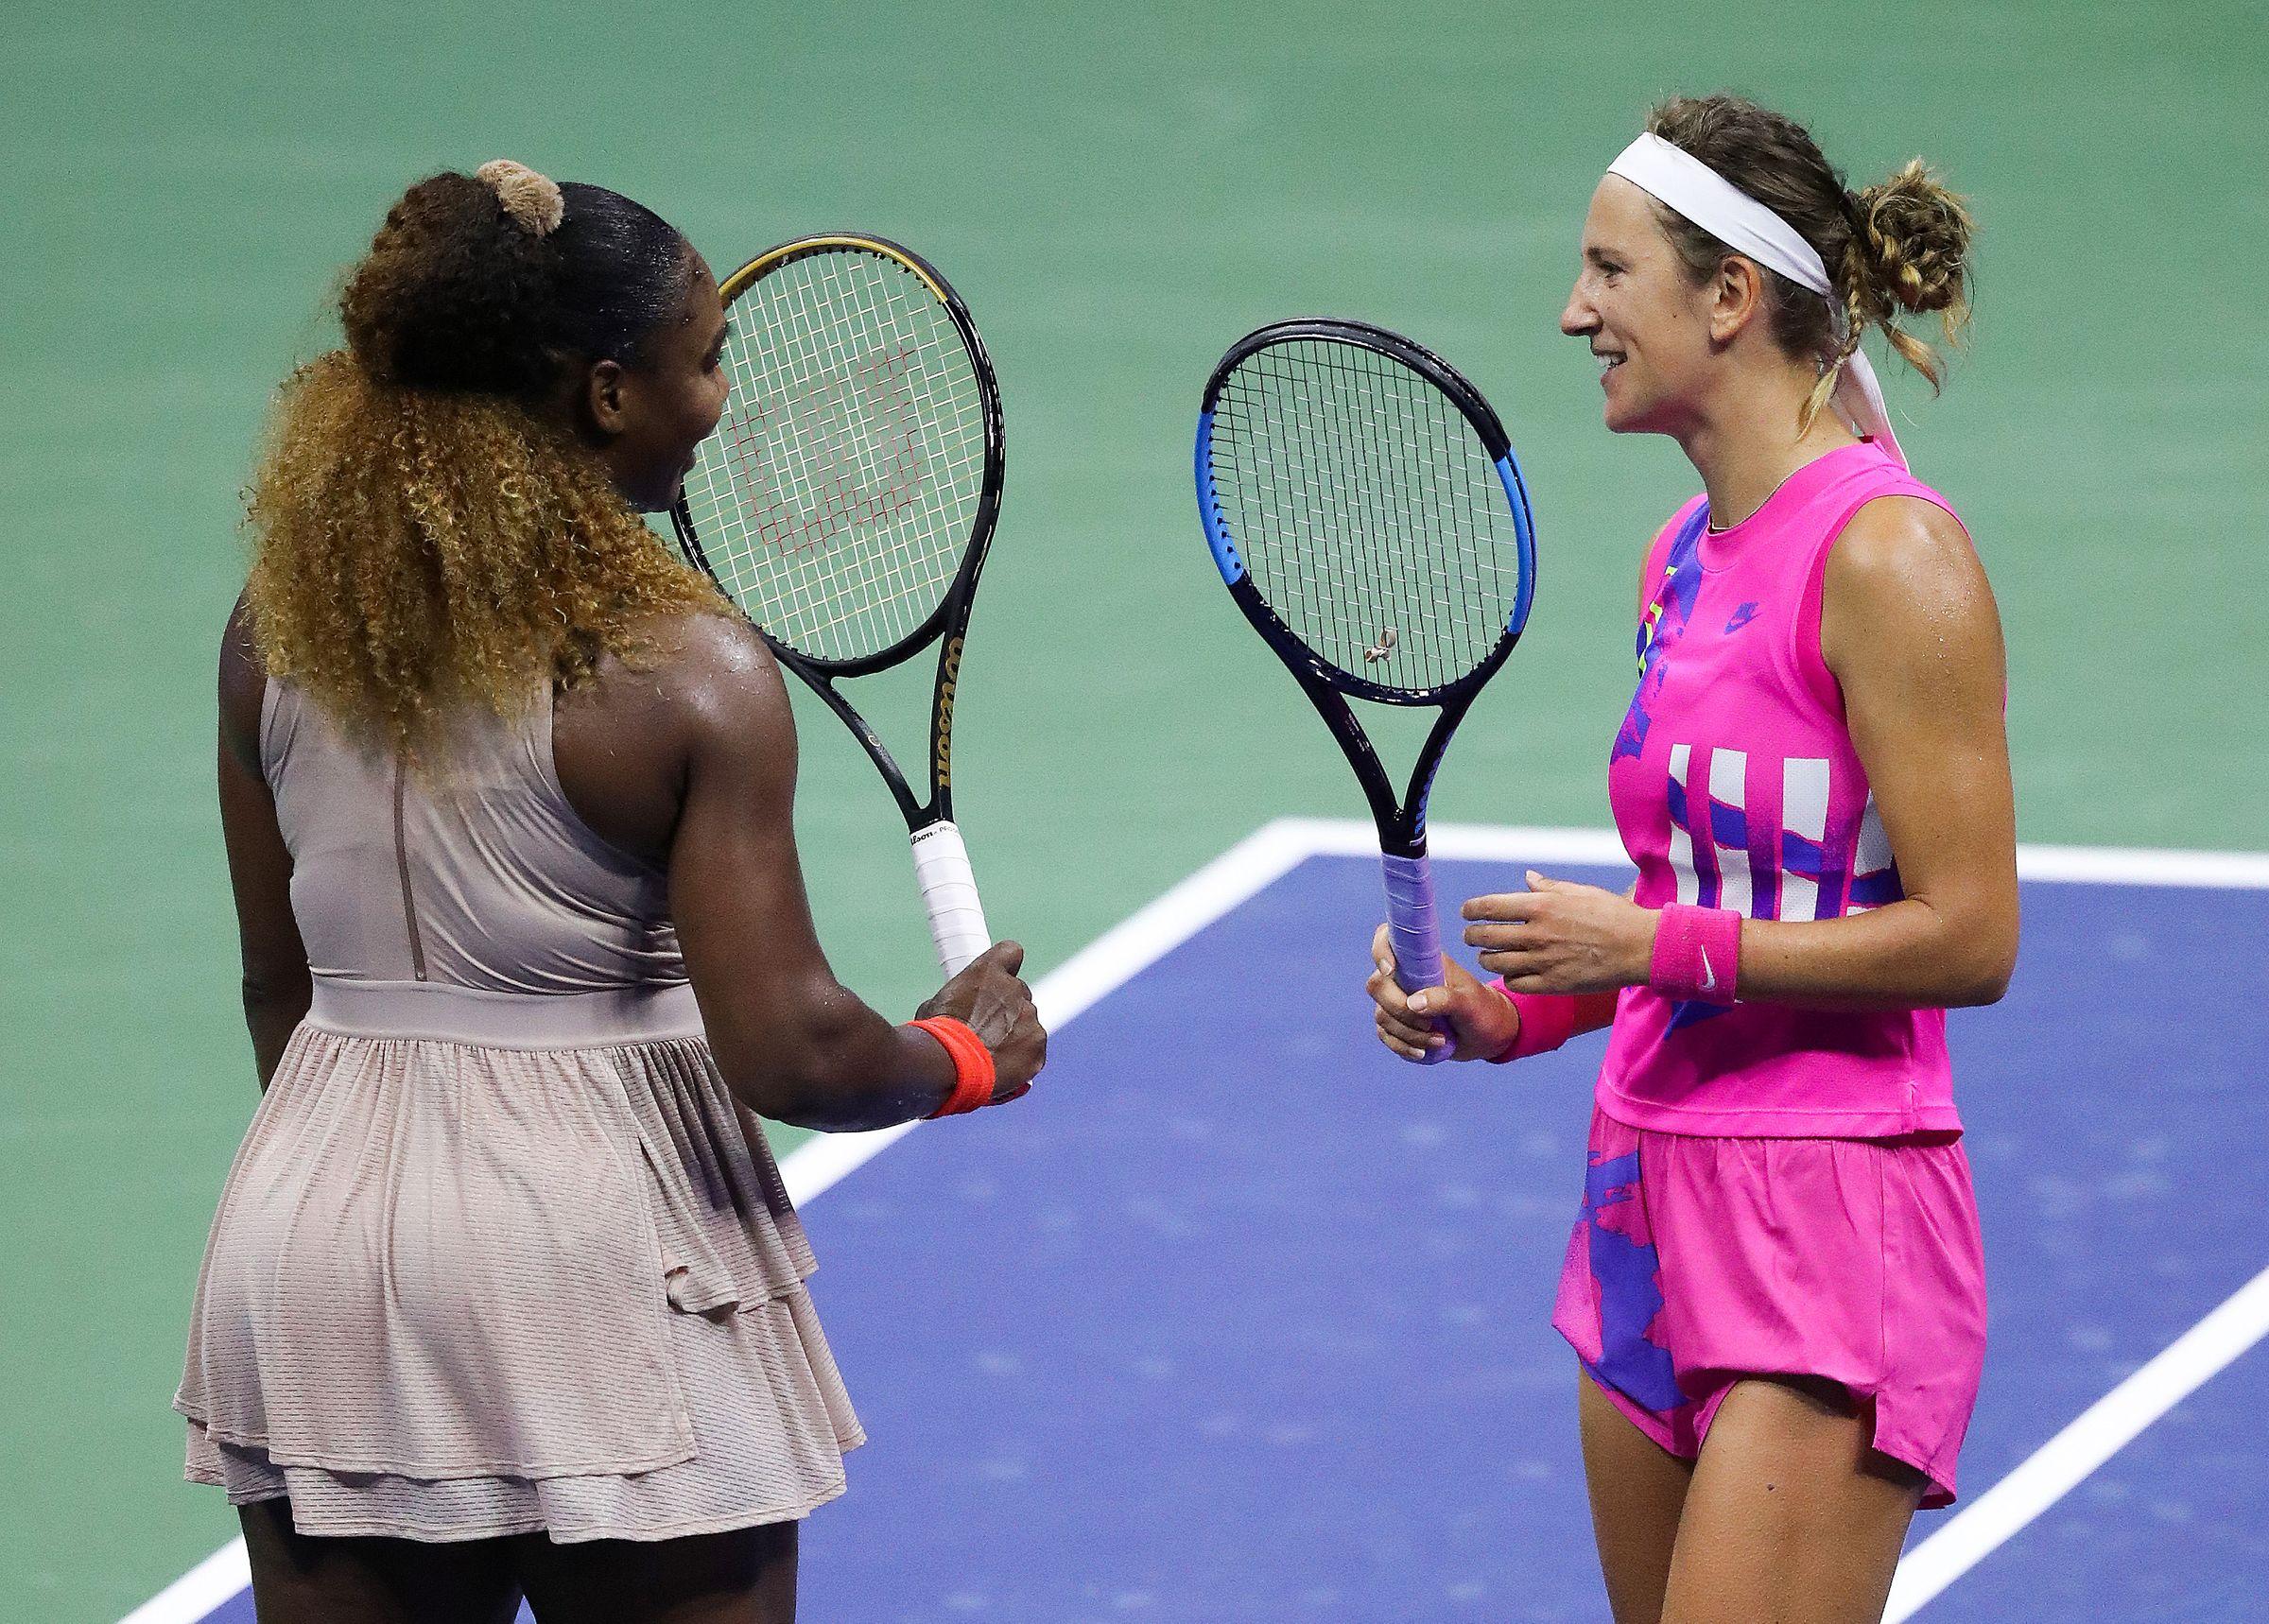 "<p>Фото © Twitter / <a href=""https://twitter.com/WTA/status/1304268868316205058/photo/1"" target=""_blank"" rel=""noopener noreferrer"">WTA</a></p>"